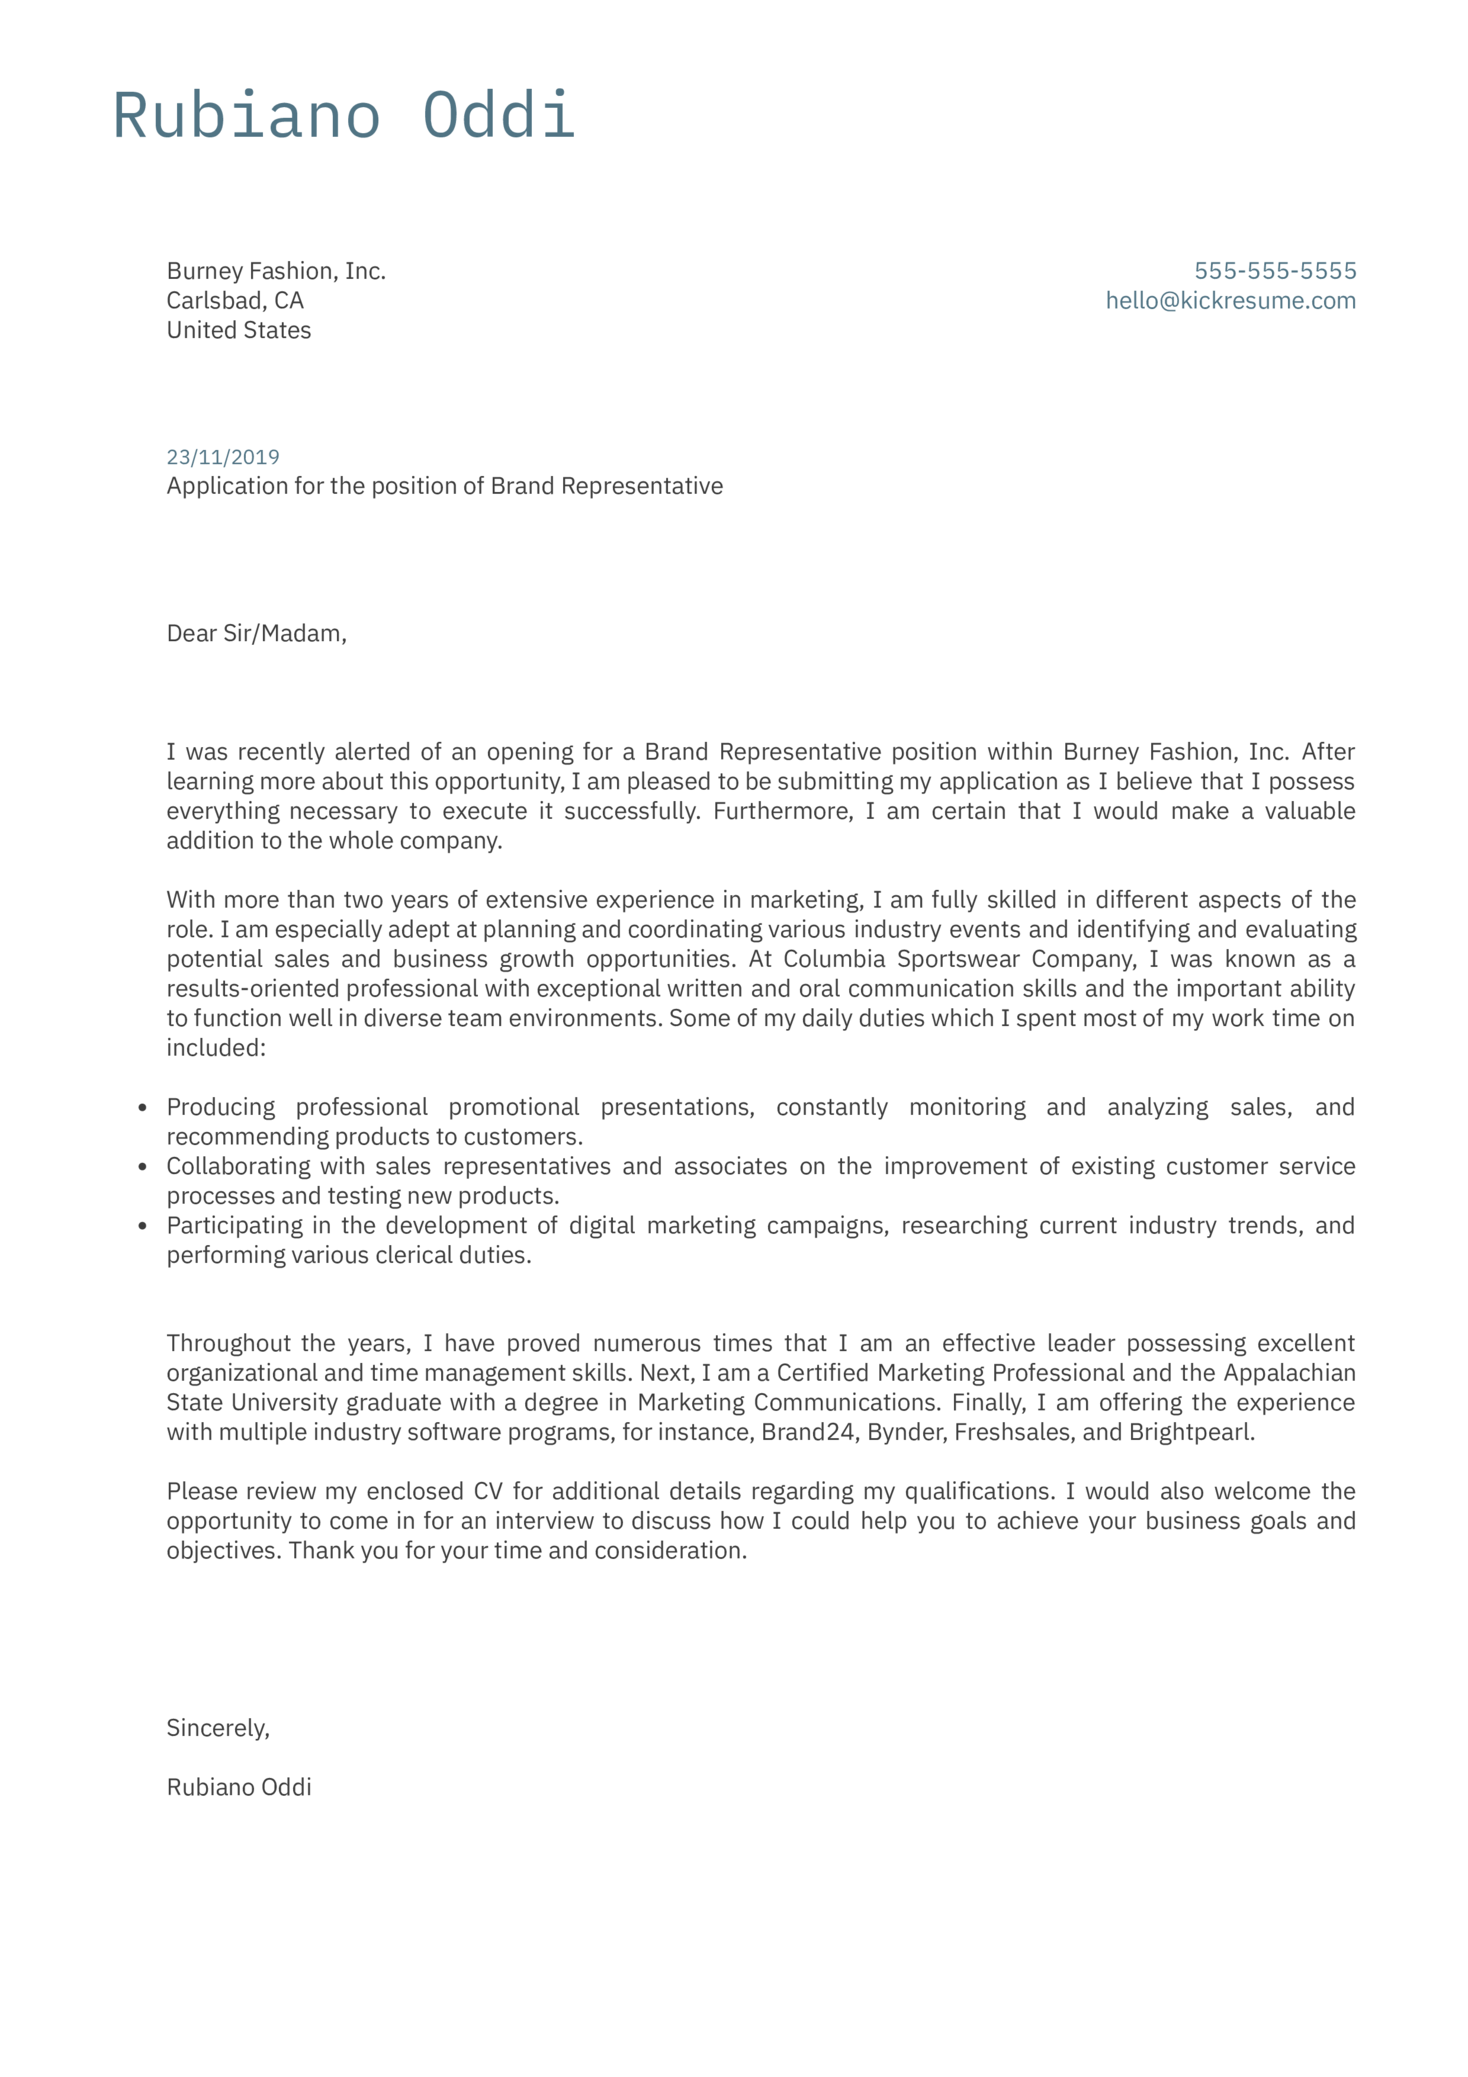 Brand Representative Cover Letter Example